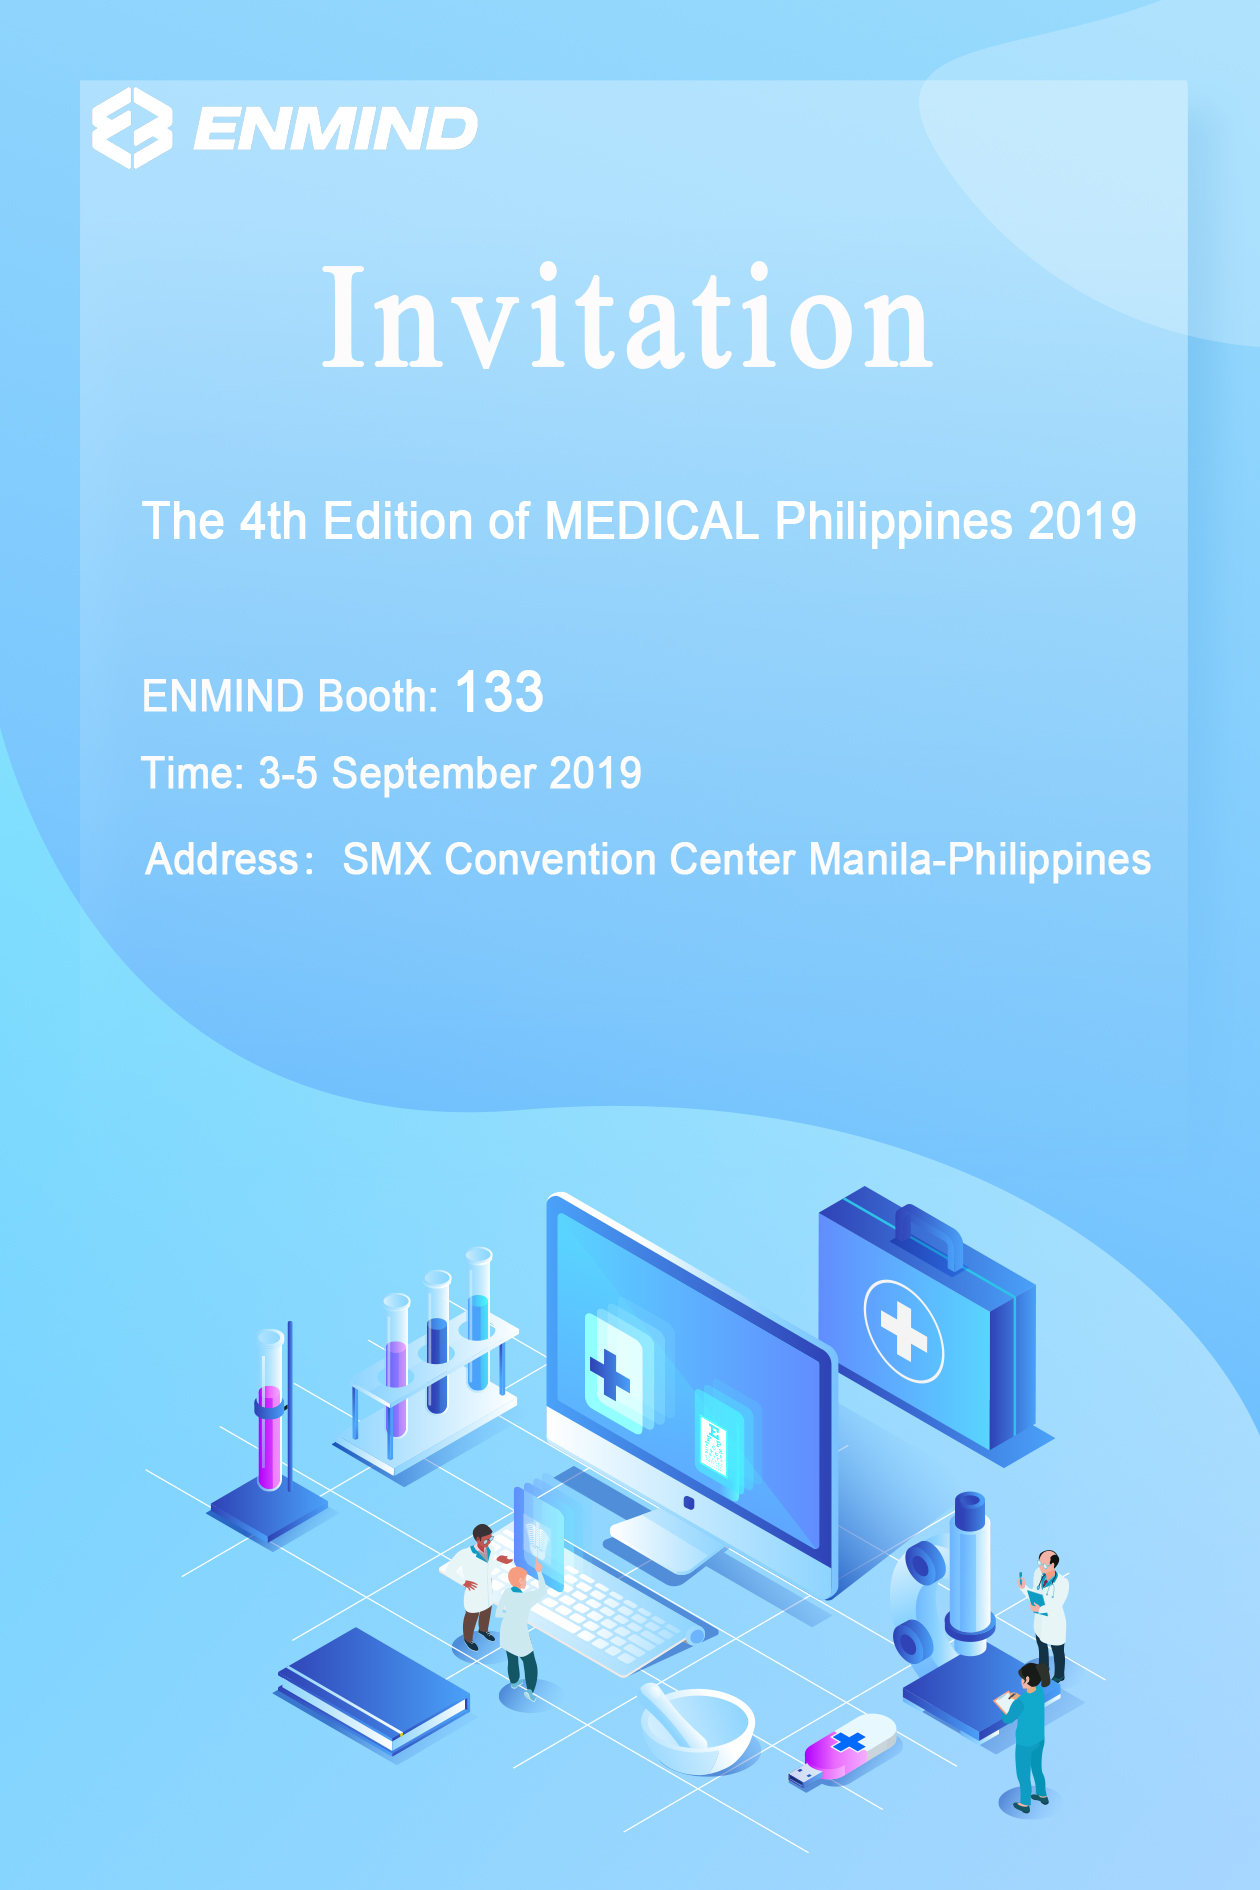 The MEDICAL Philippines 2019 Invitation